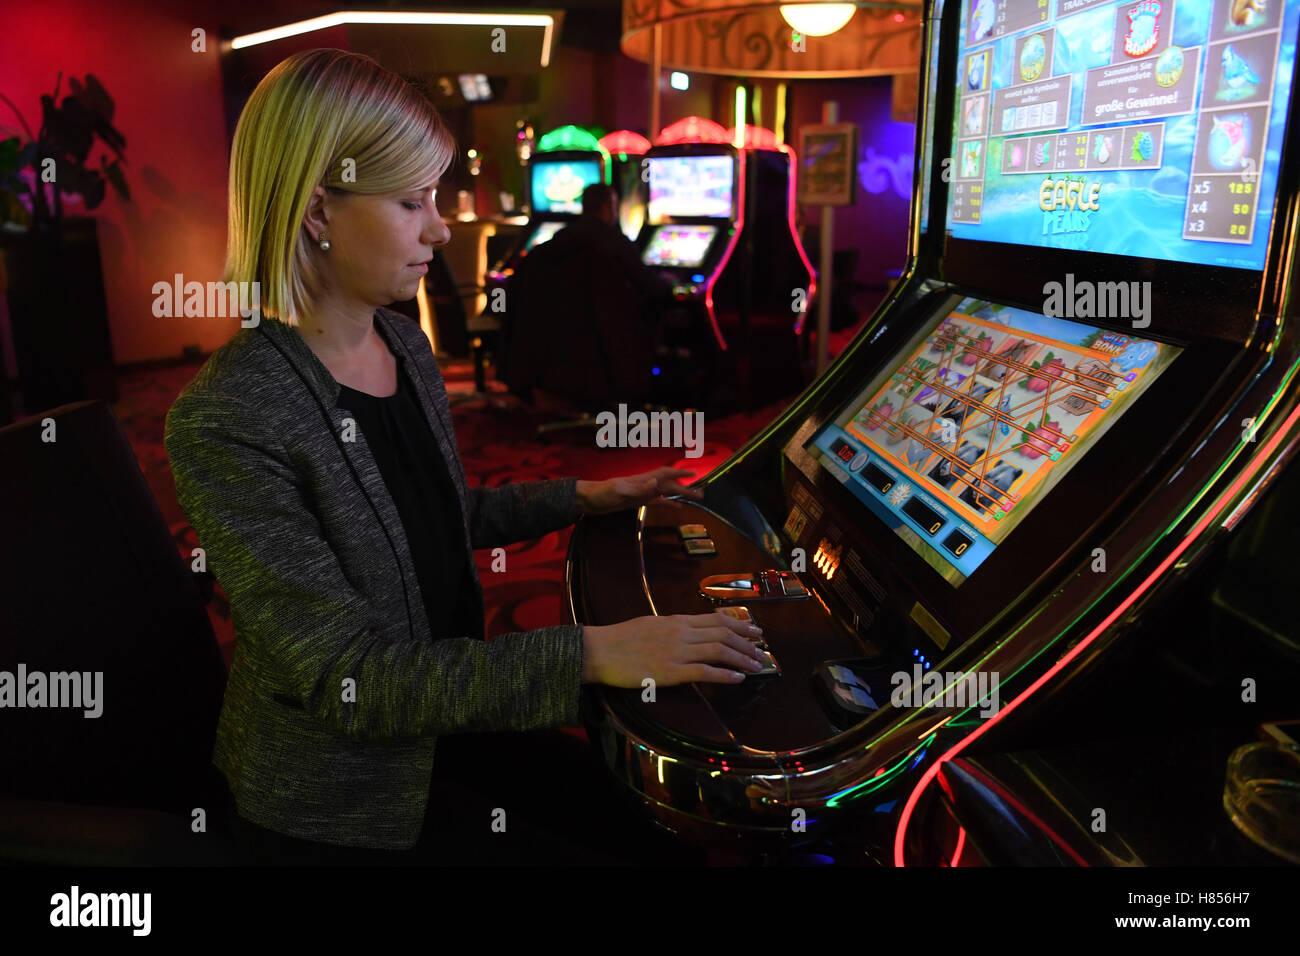 Star city casino poker room